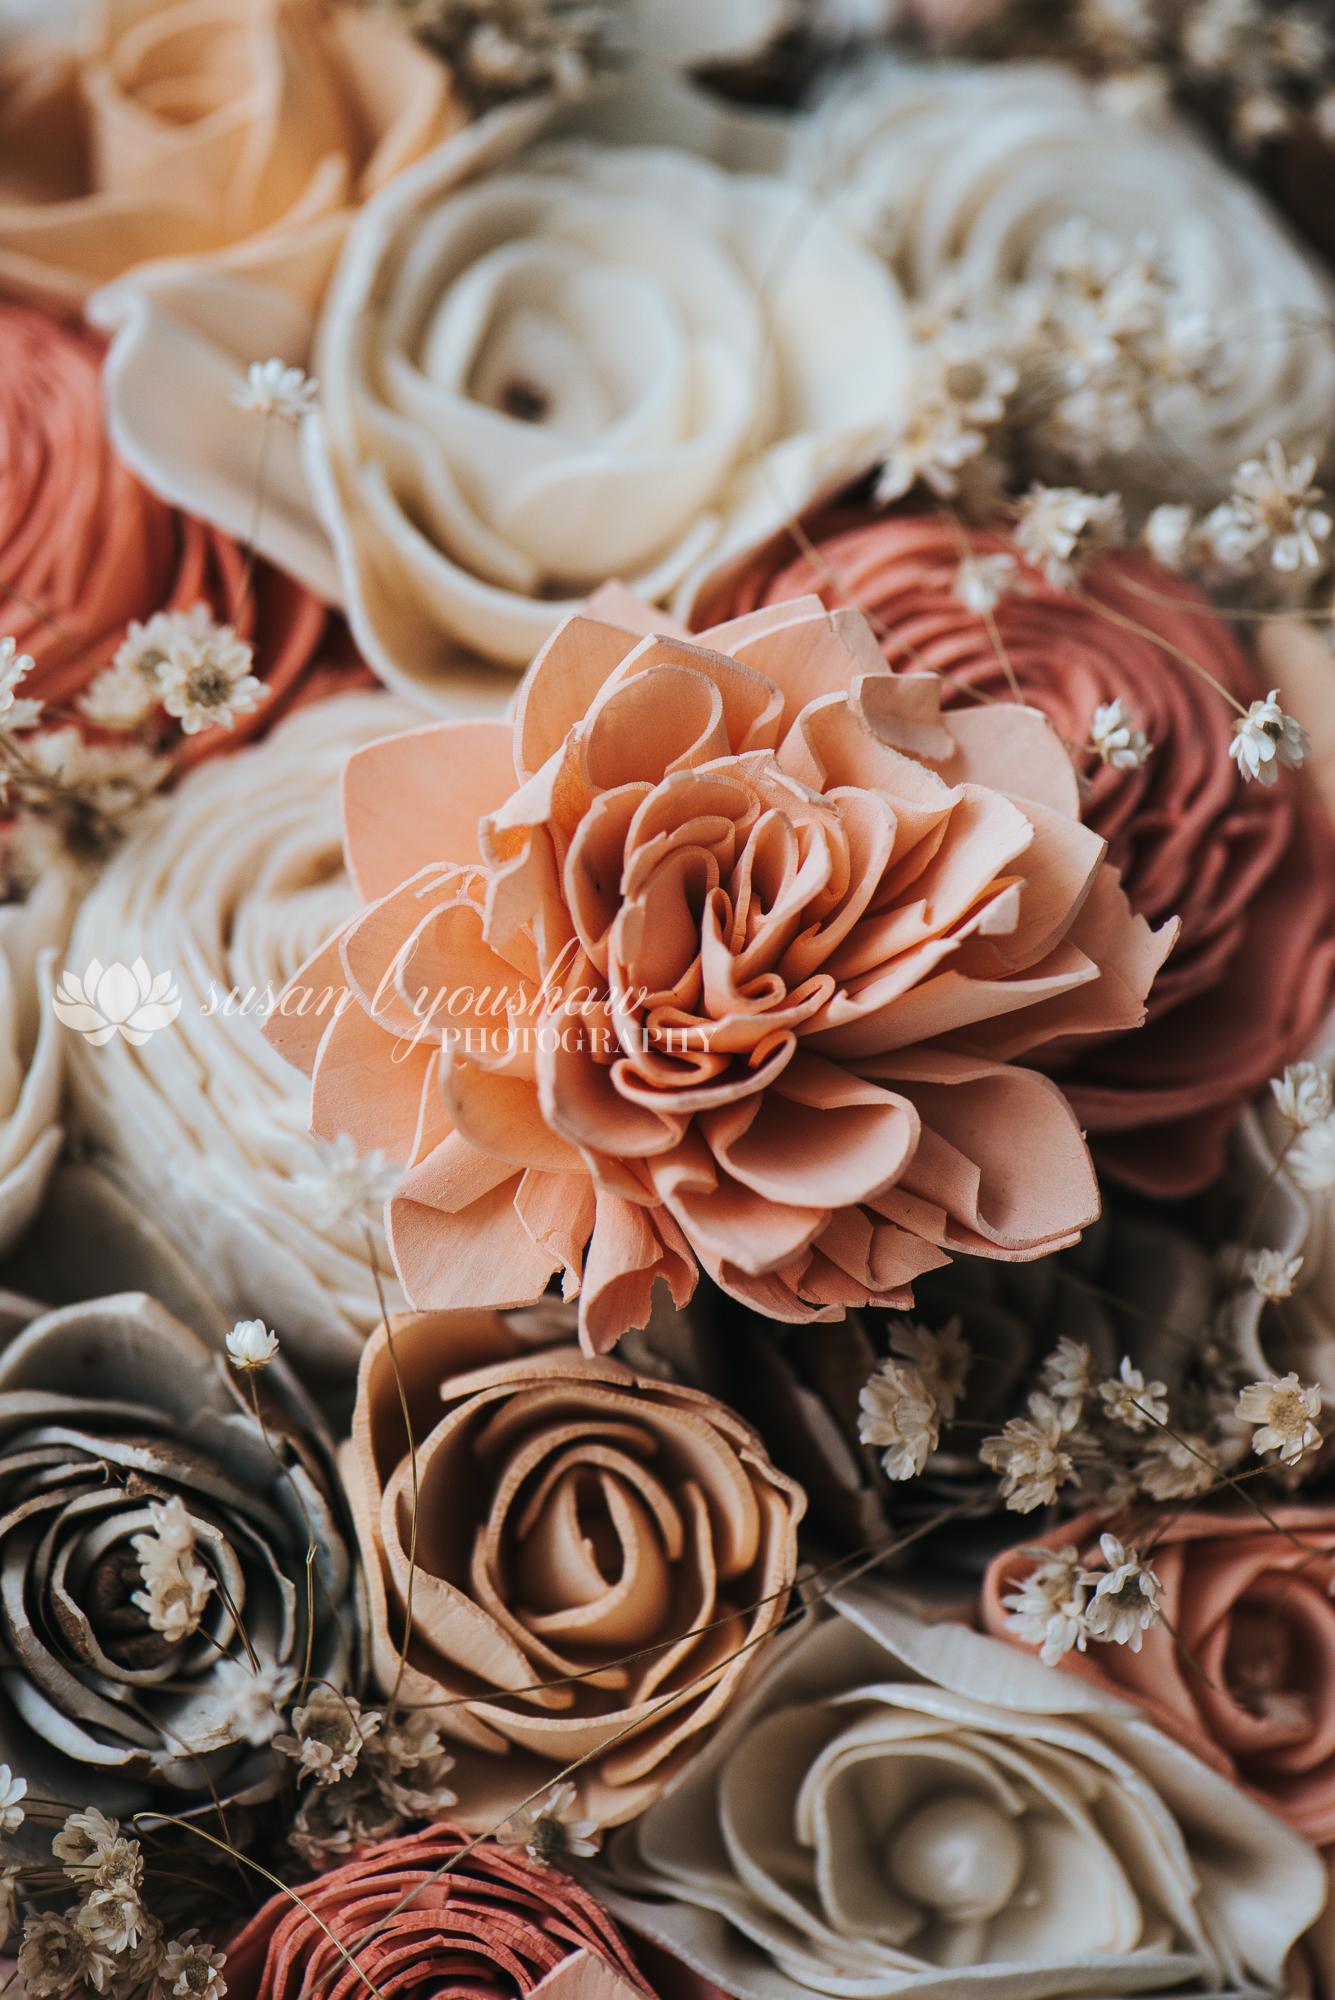 Bill and Sarah Wedding Photos 06-08-2019 SLY Photography -21.jpg